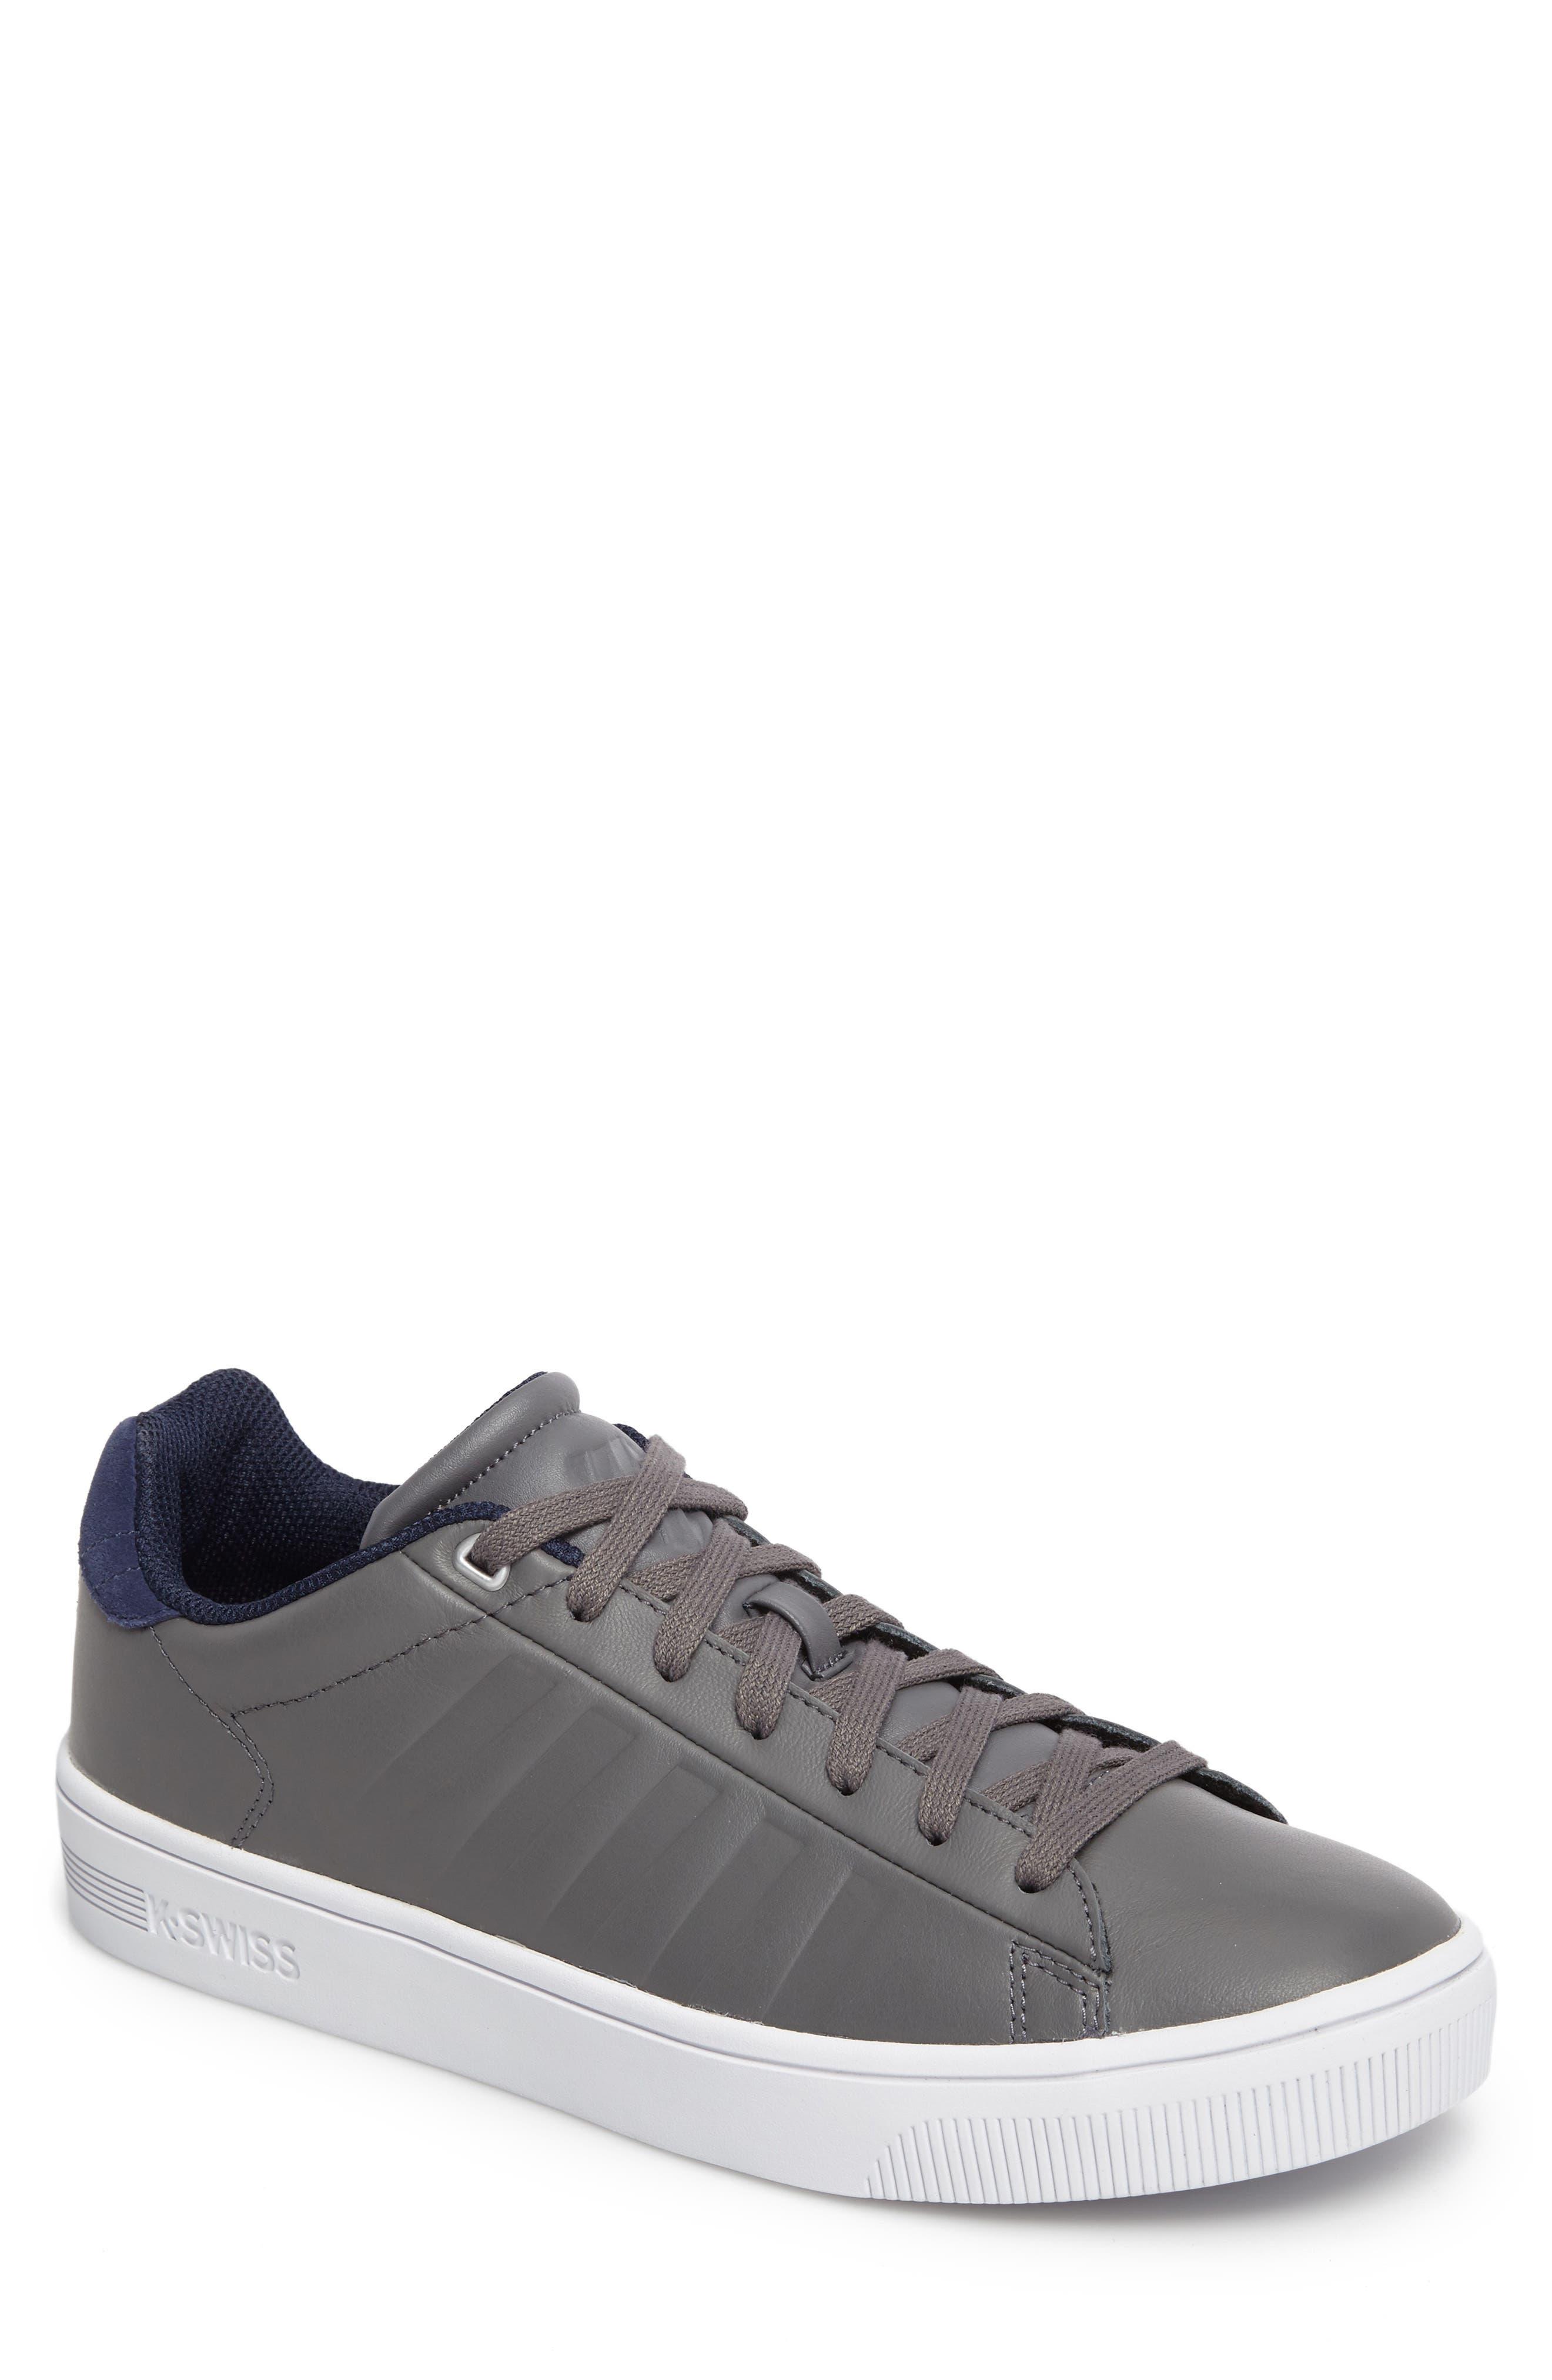 Court Frasco Sneaker,                         Main,                         color, Pewter/ Patriot Blue